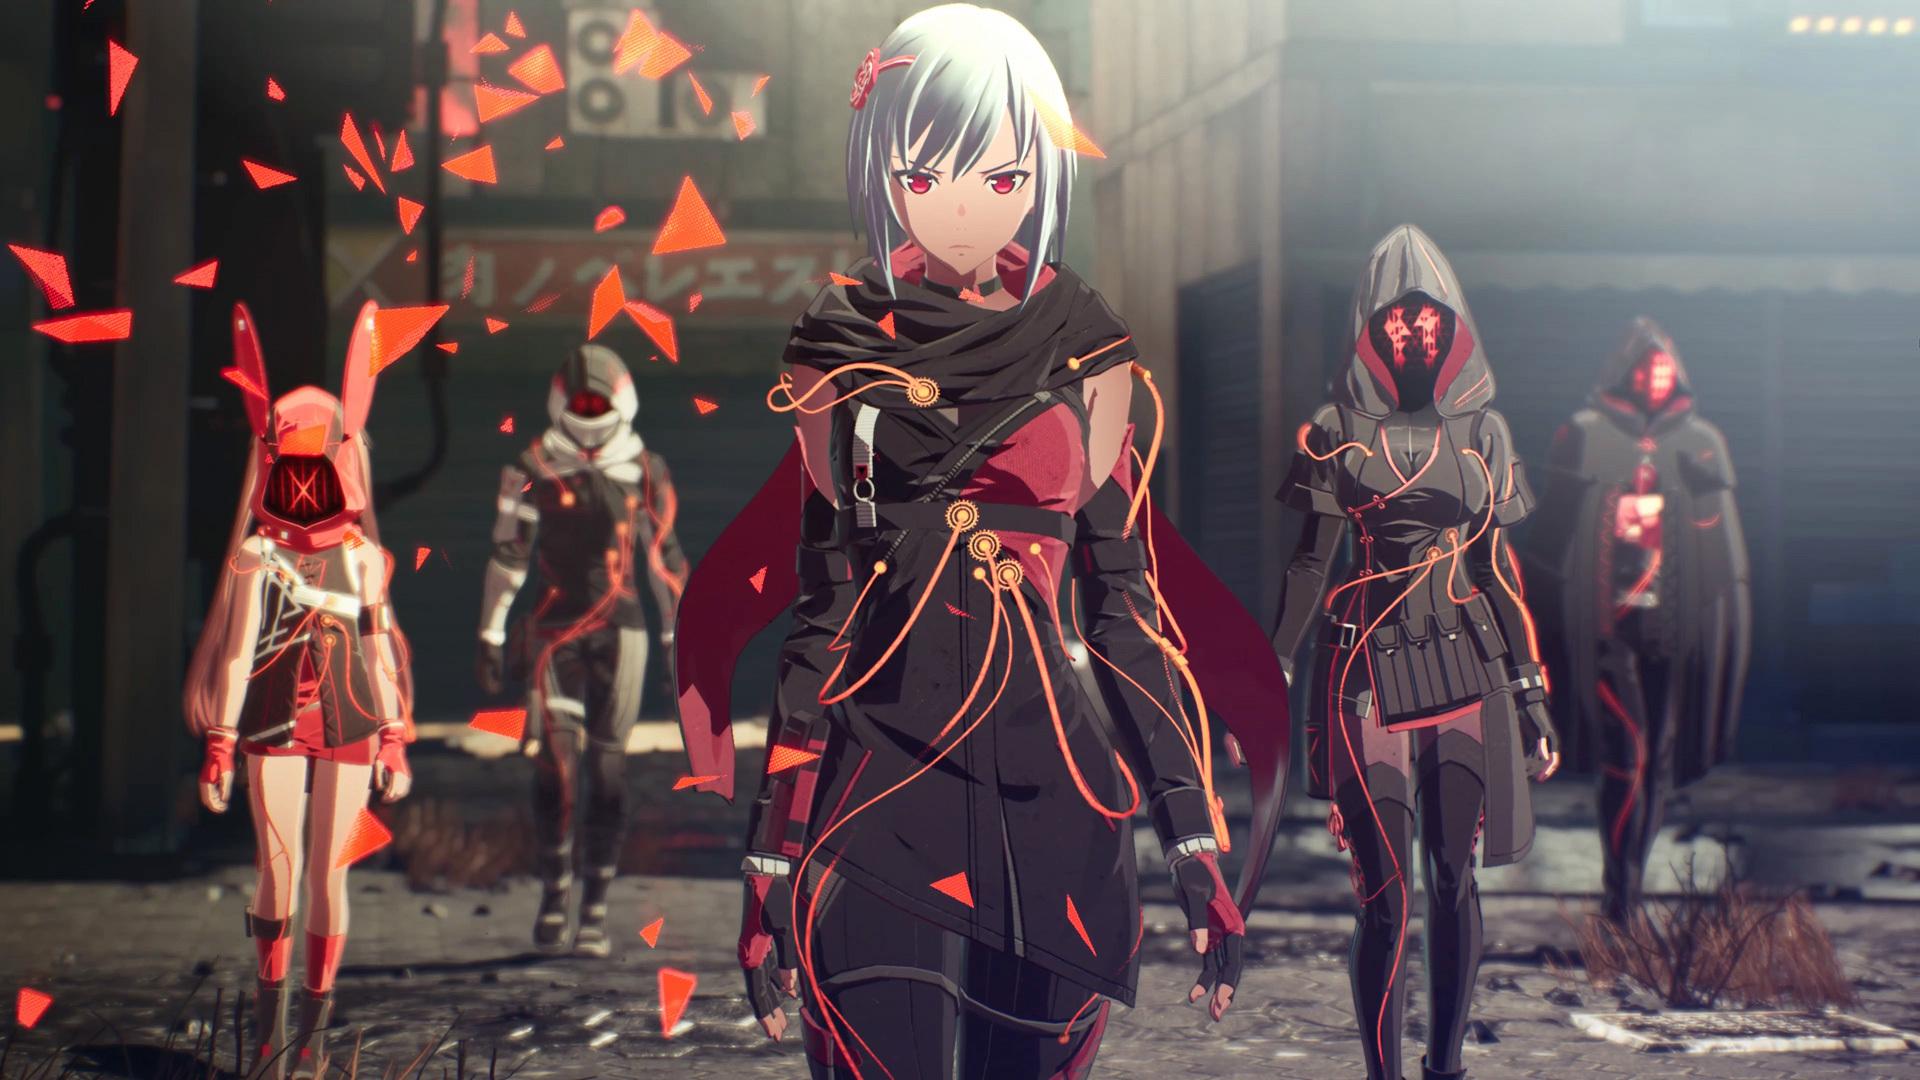 Scarlet Nexus Is There Co-Op Multiplayer